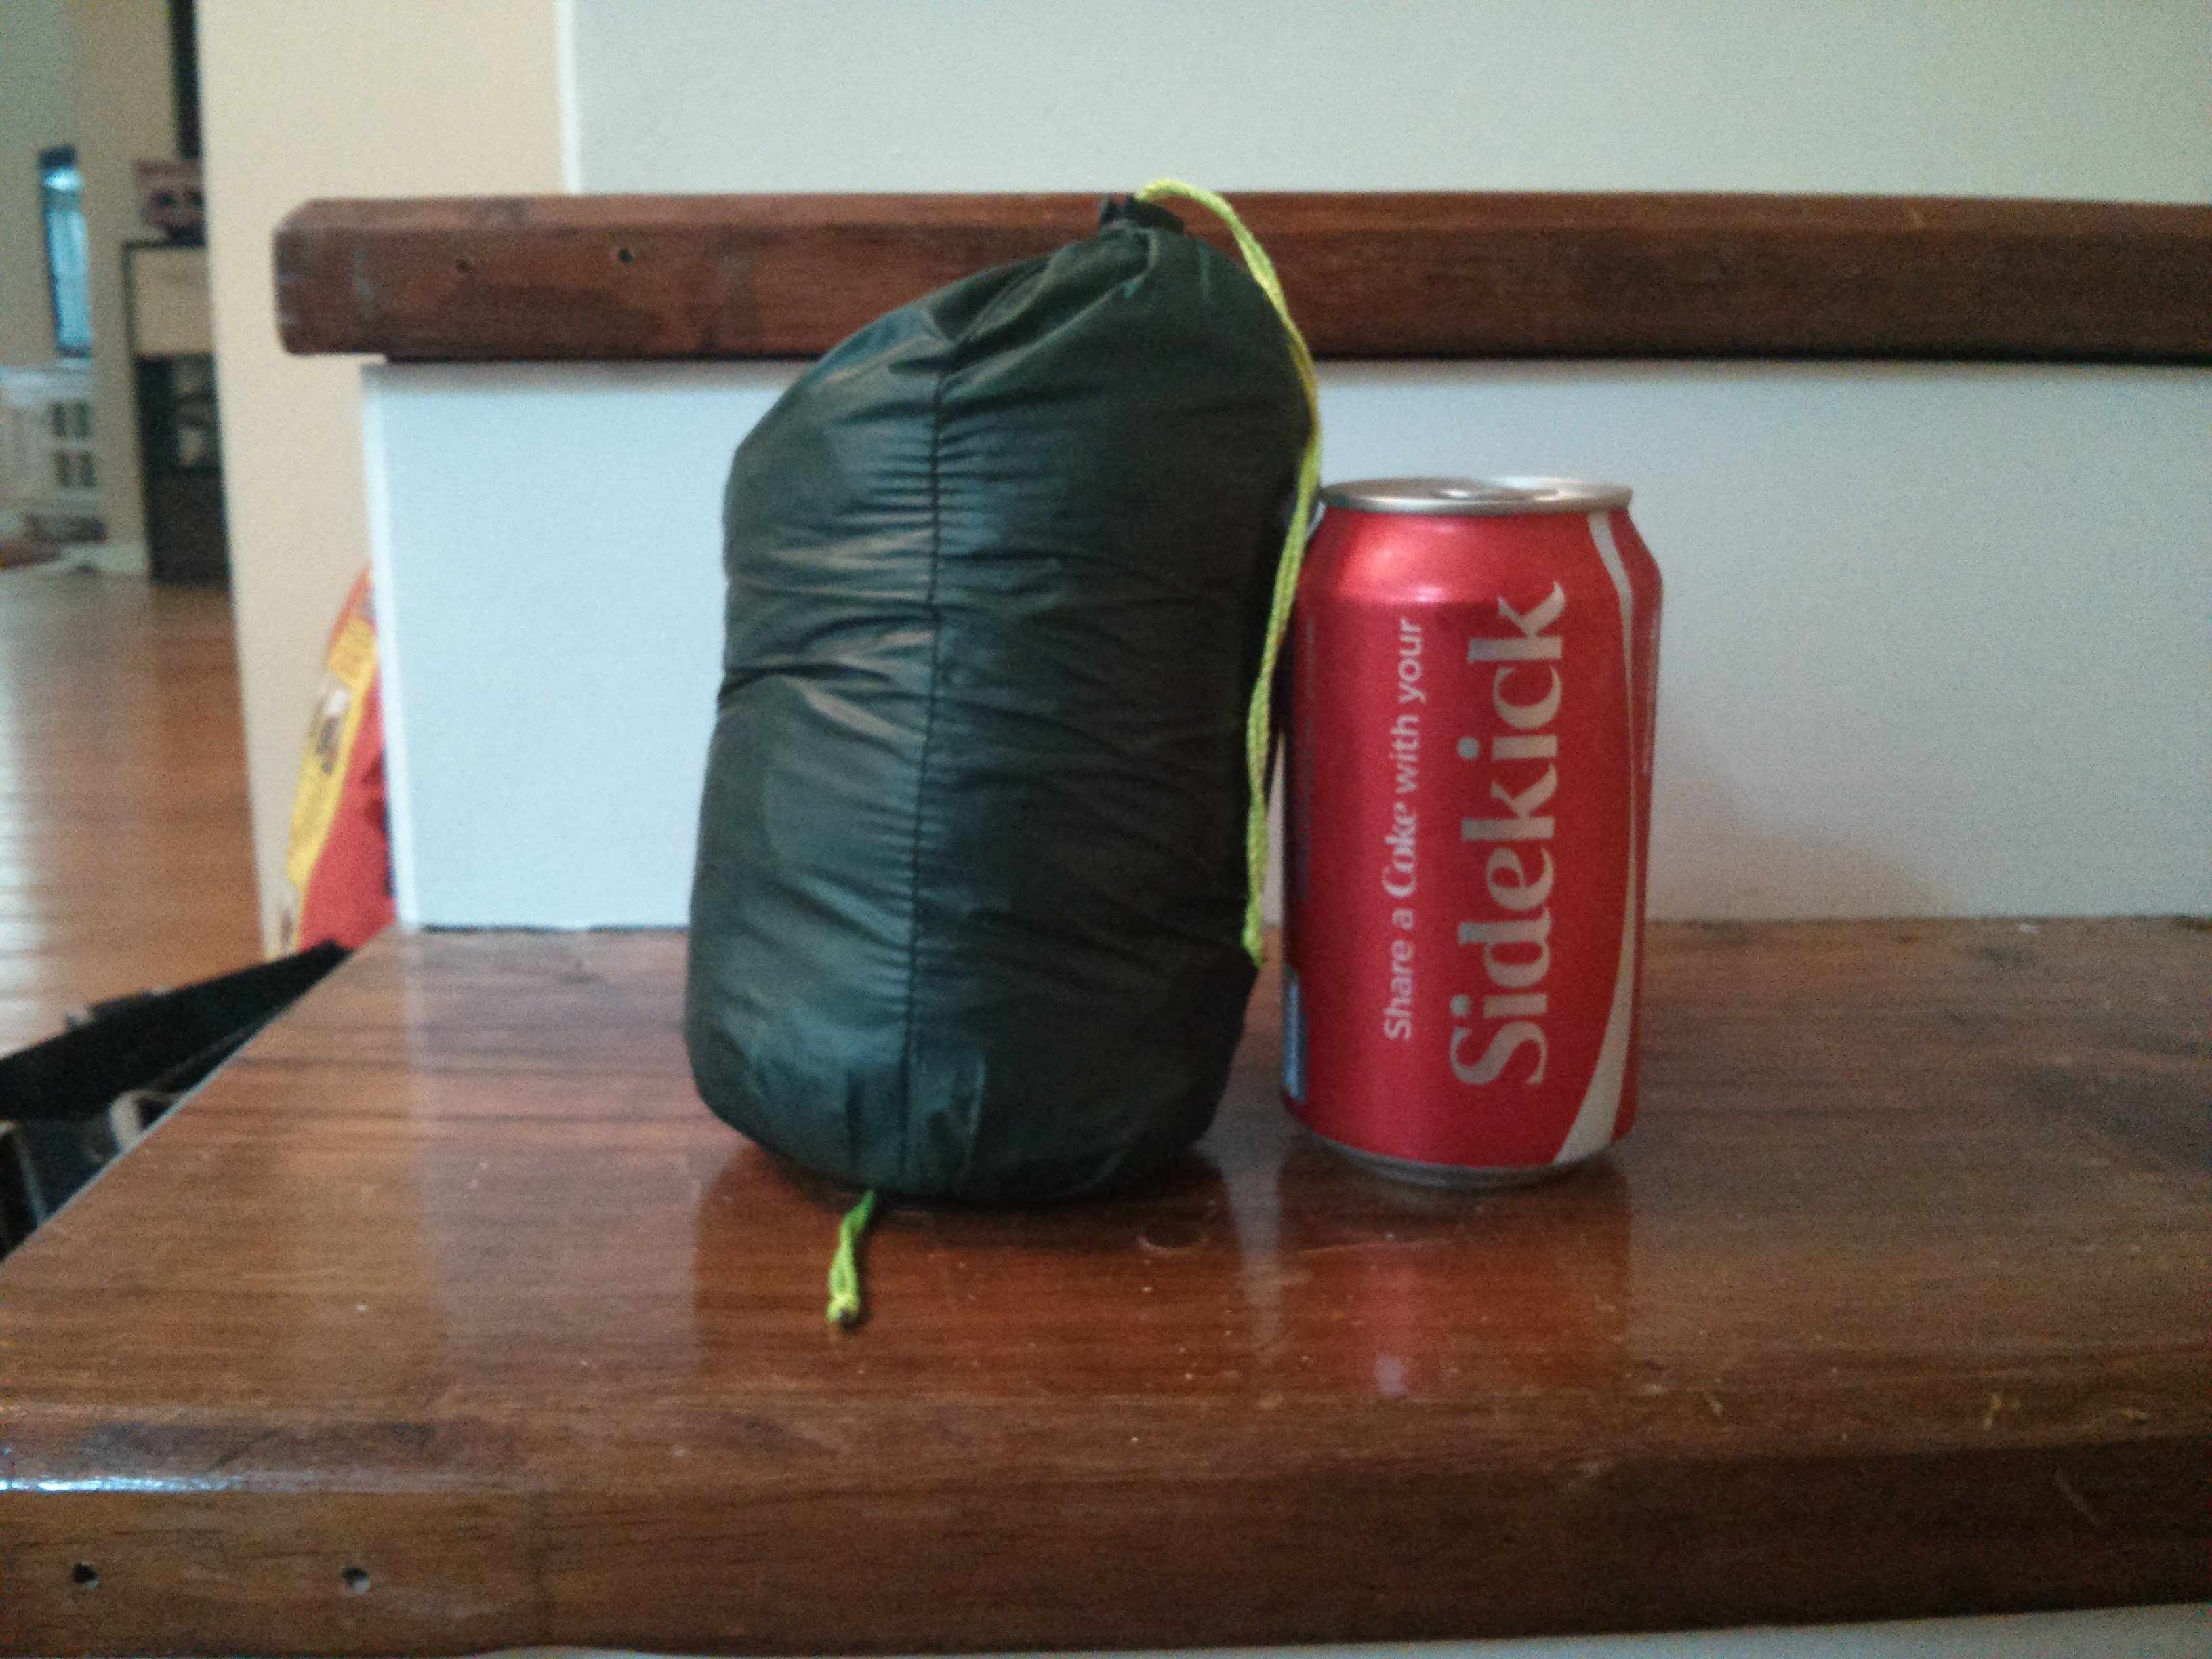 Momentum M50 hammock size